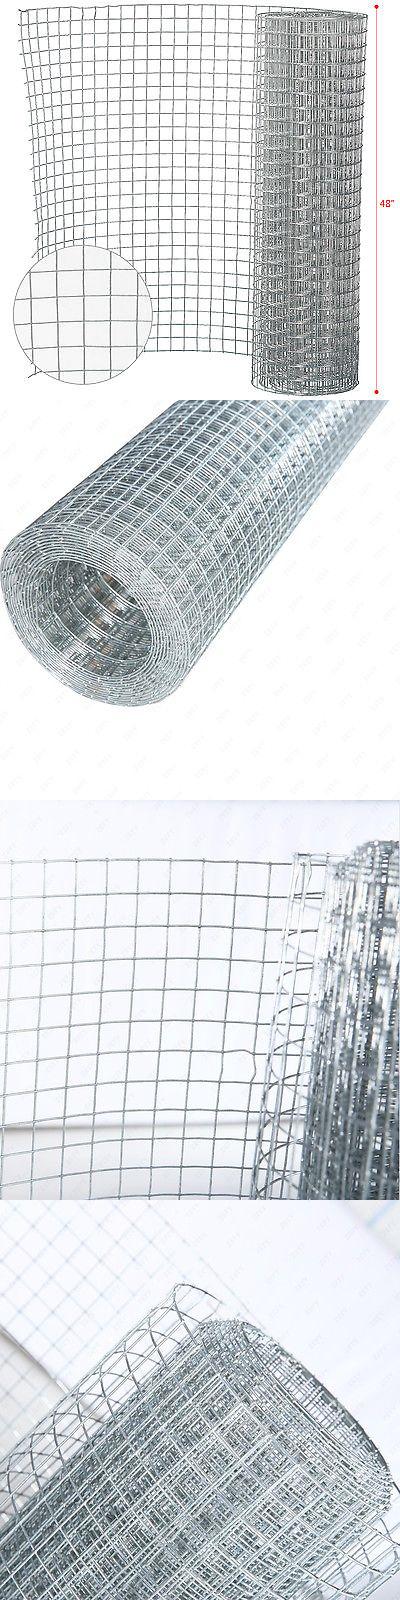 Hardware Cloth Metal Mesh 180985: 48 ×50 1 2 Galvanized Welded Wire ...